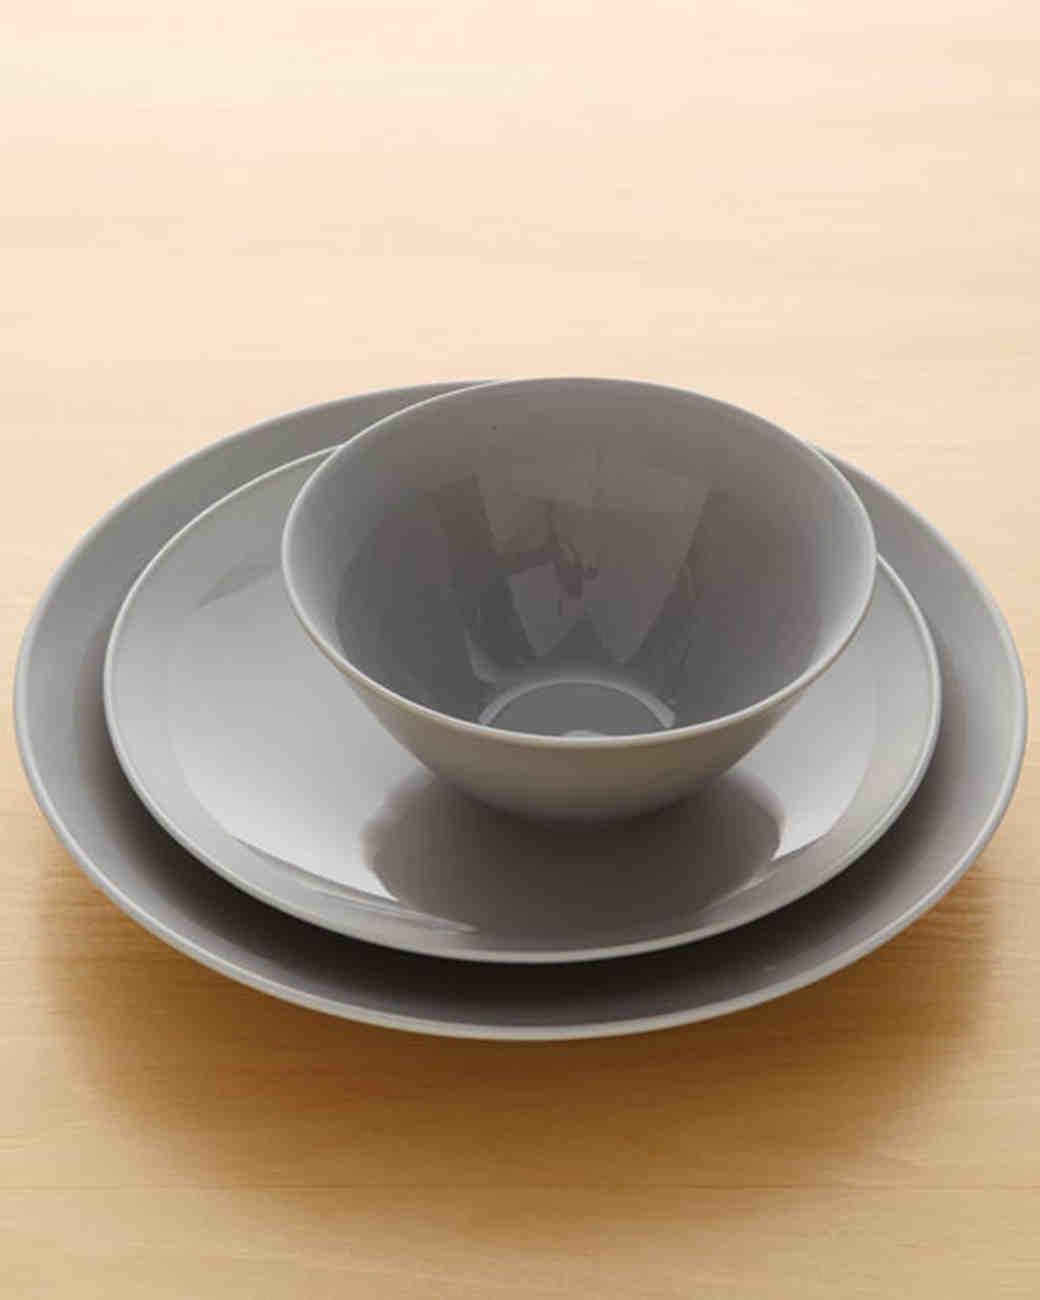 mw106509_spr11_bowl01.jpg